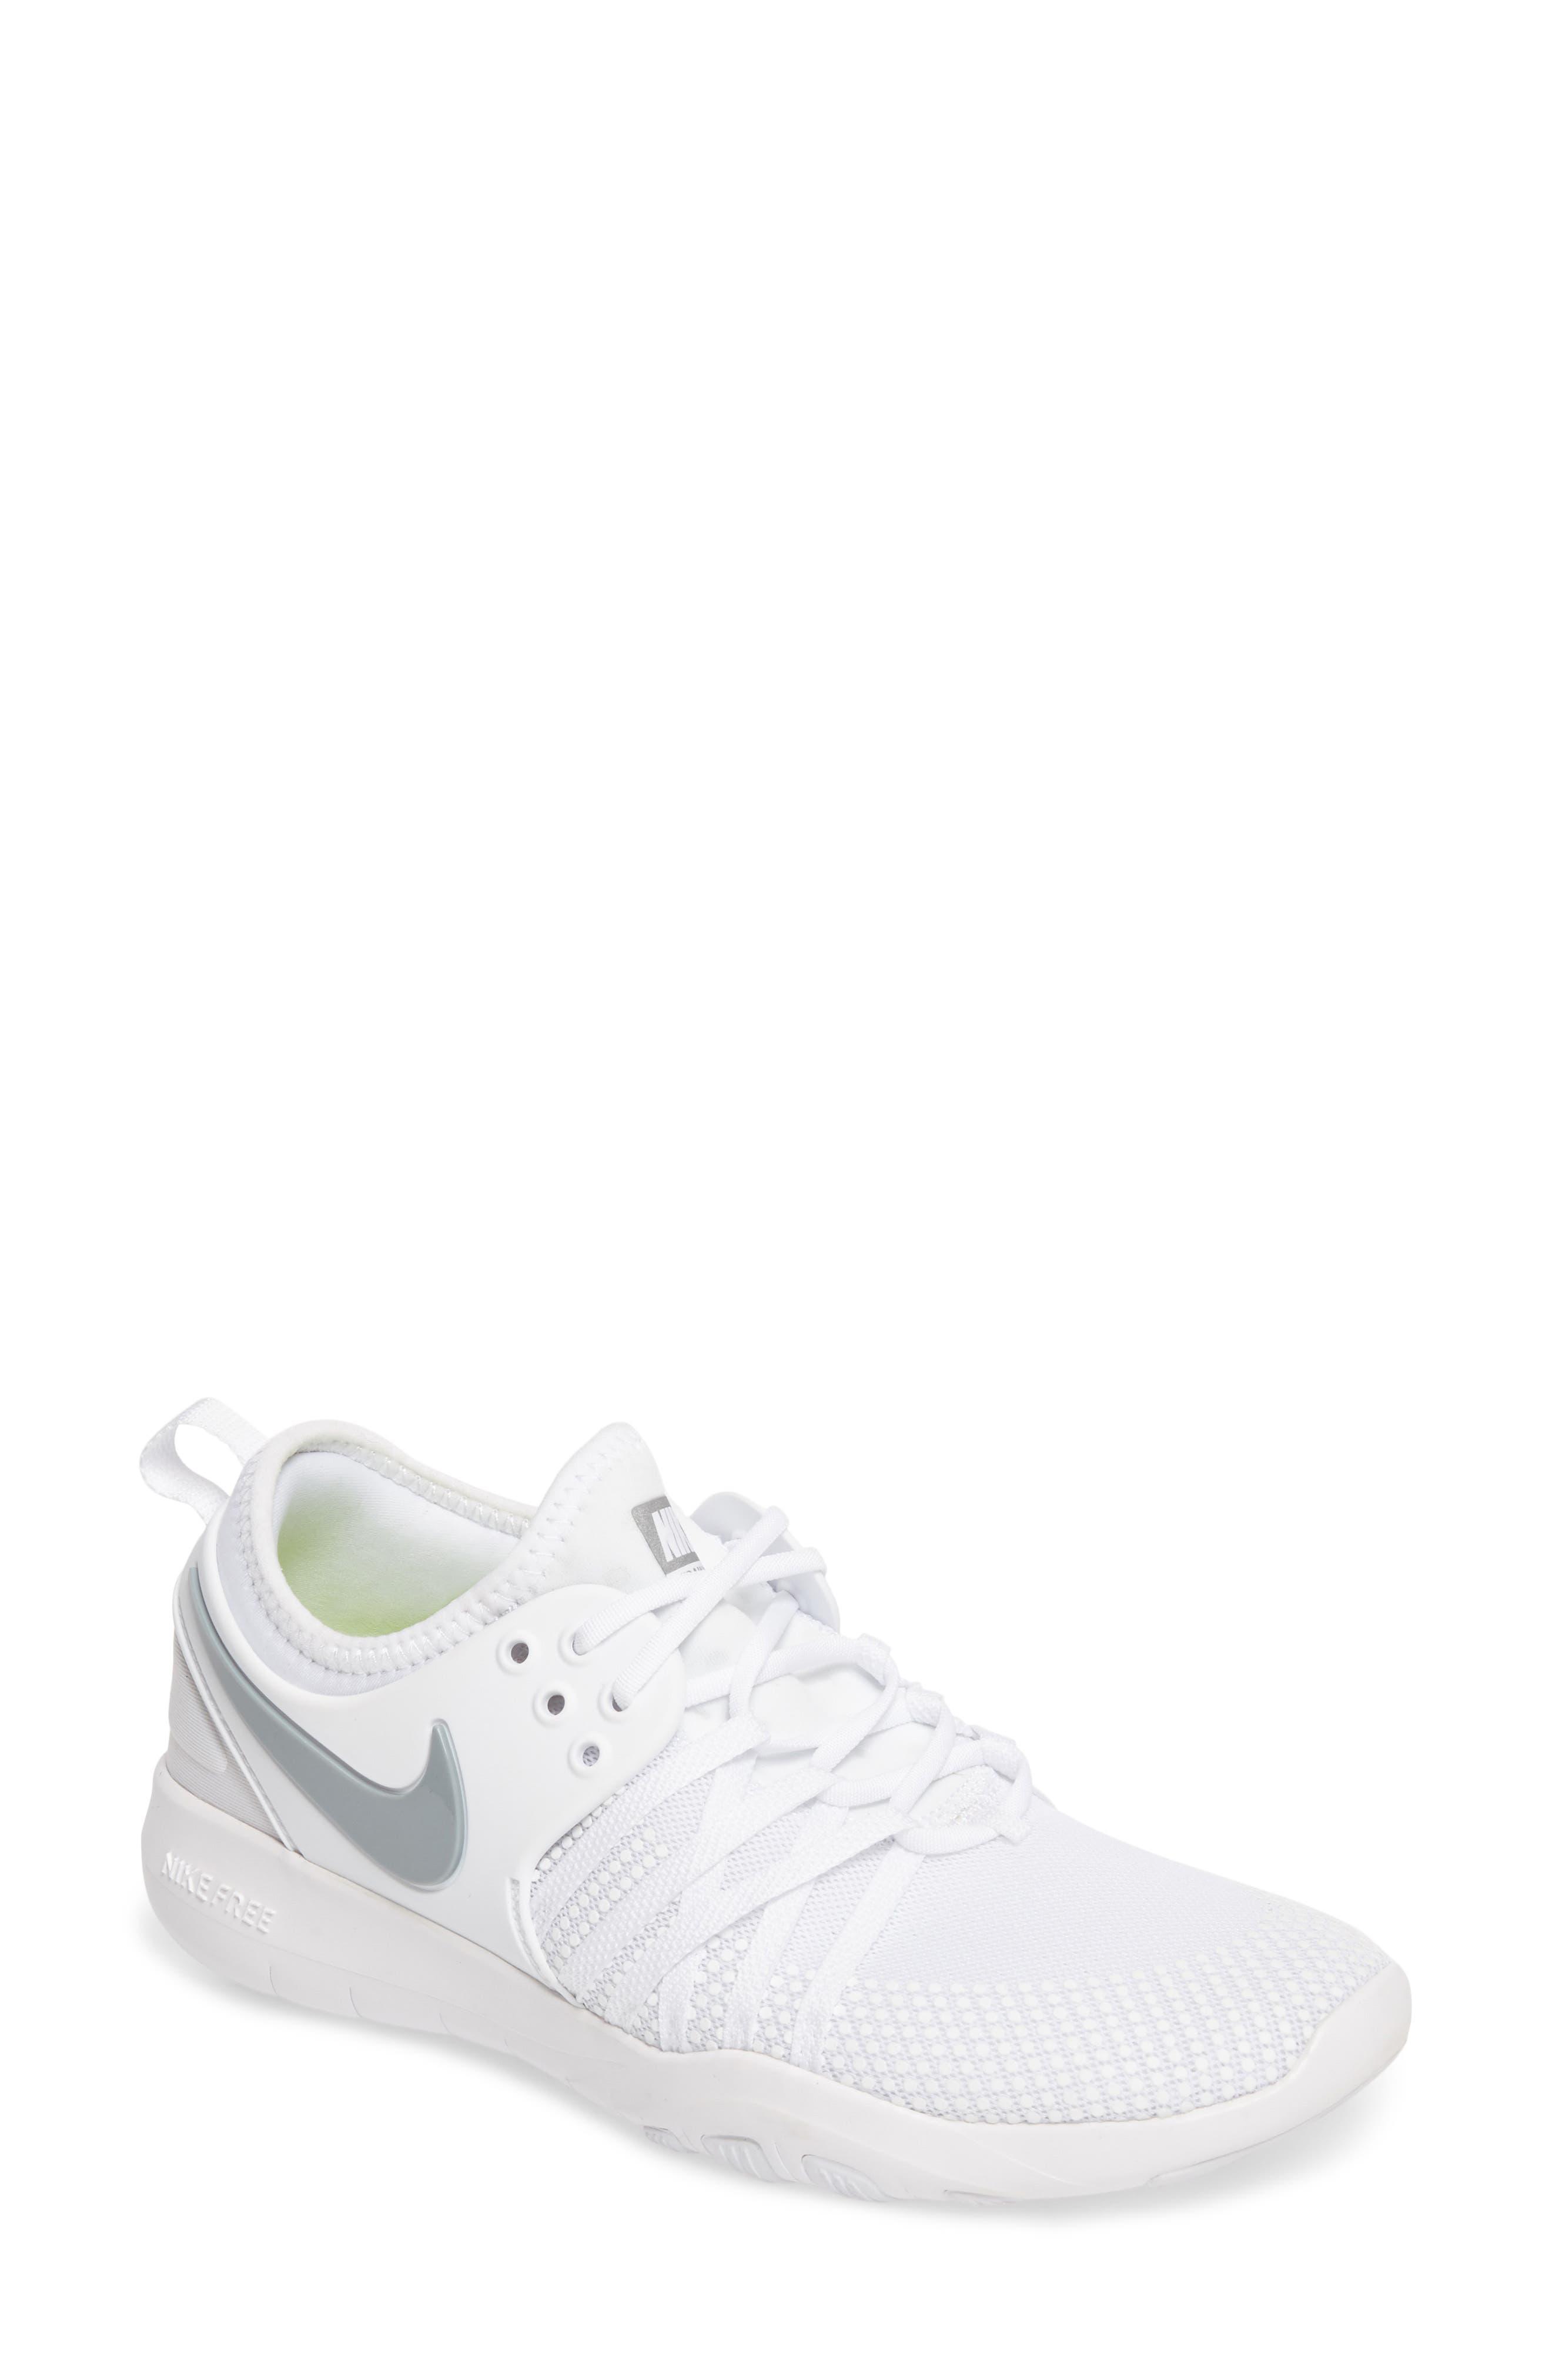 Free TR 7 Training Shoe,                         Main,                         color, White/ Metallic Silver